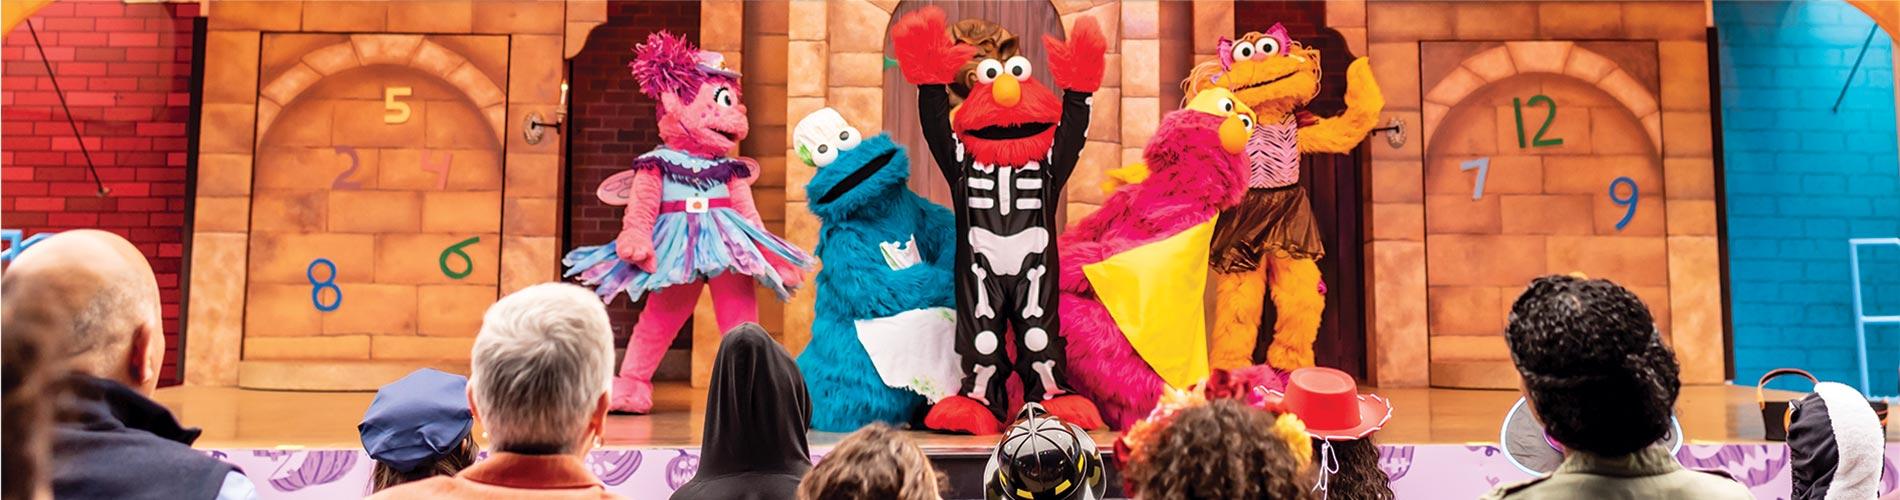 Countdown to Halloween show during SeaWorld San Diego Halloween Spooktacular